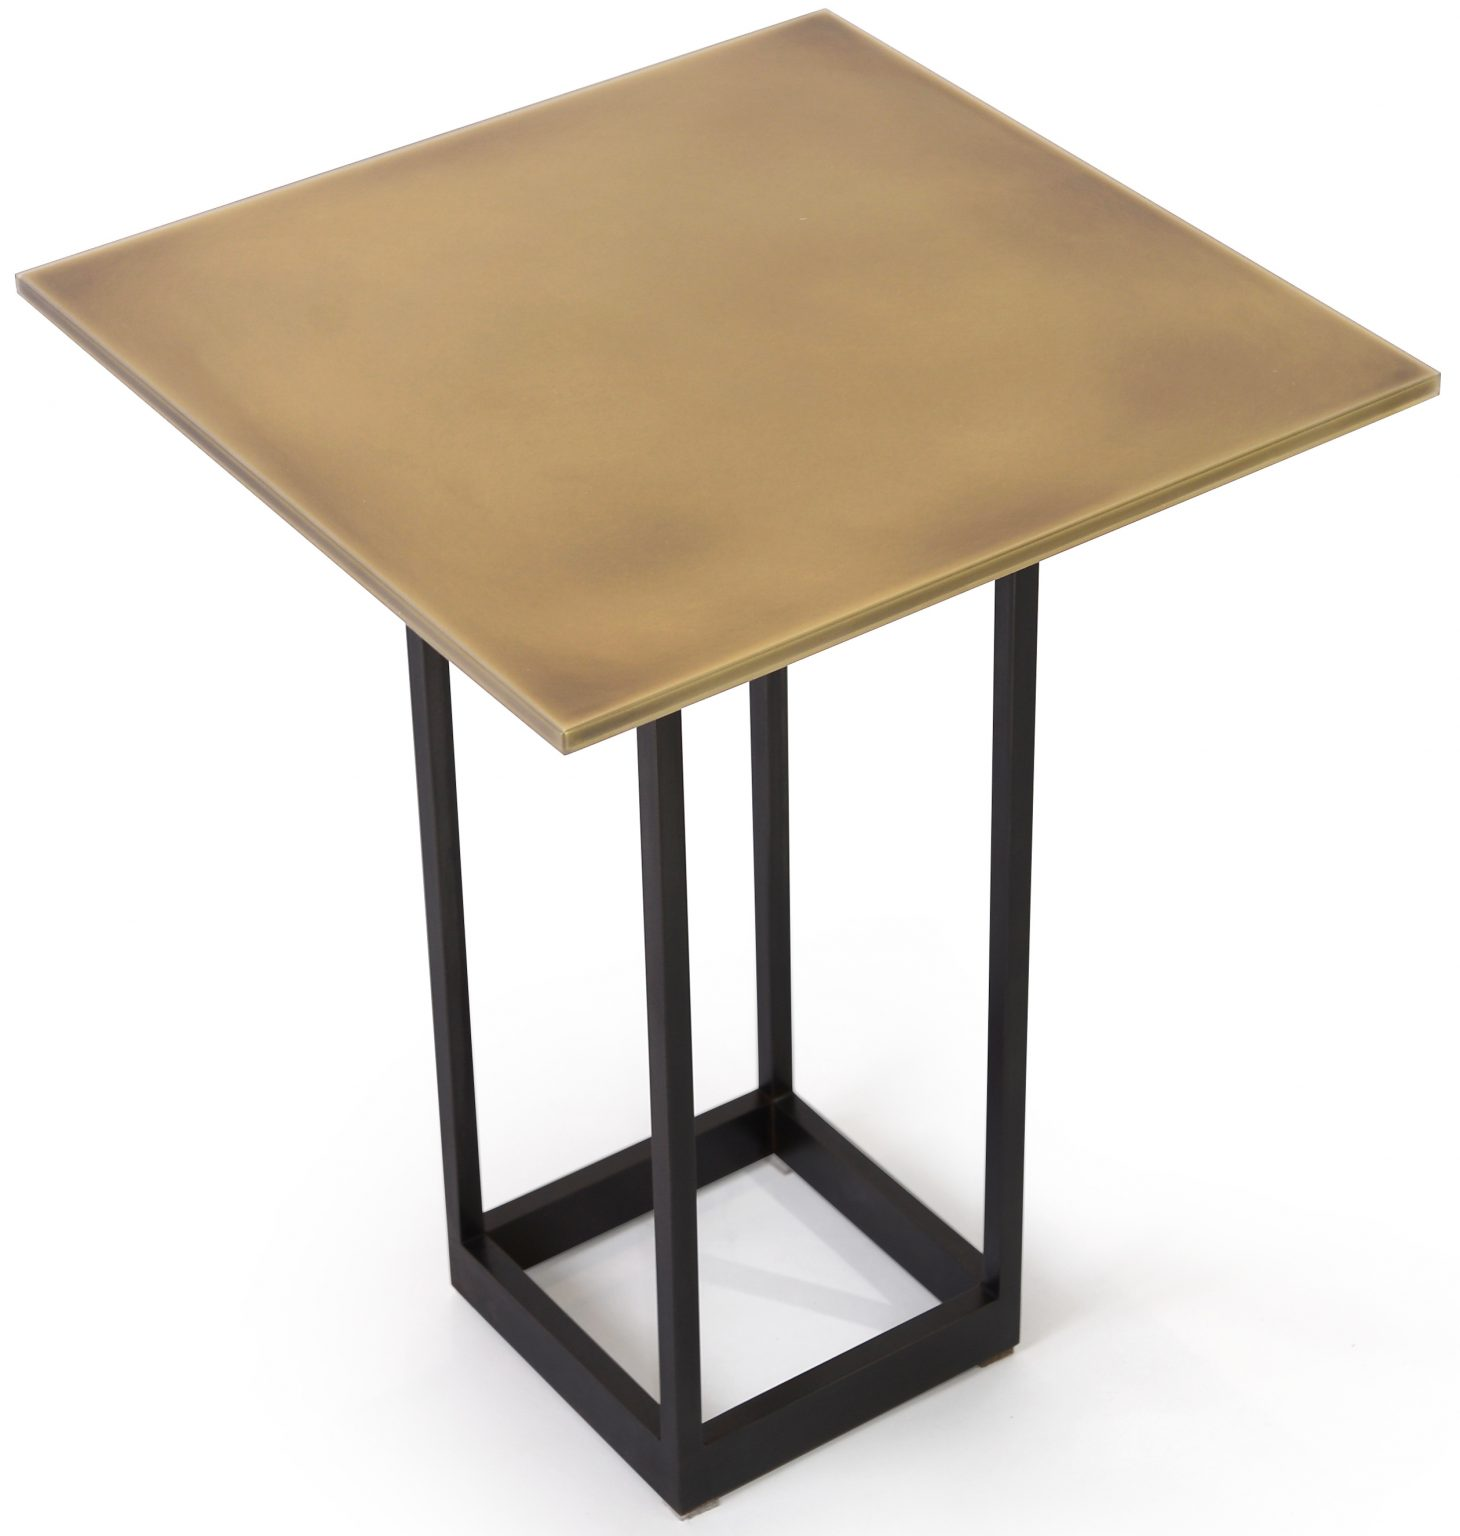 Gotham End Table